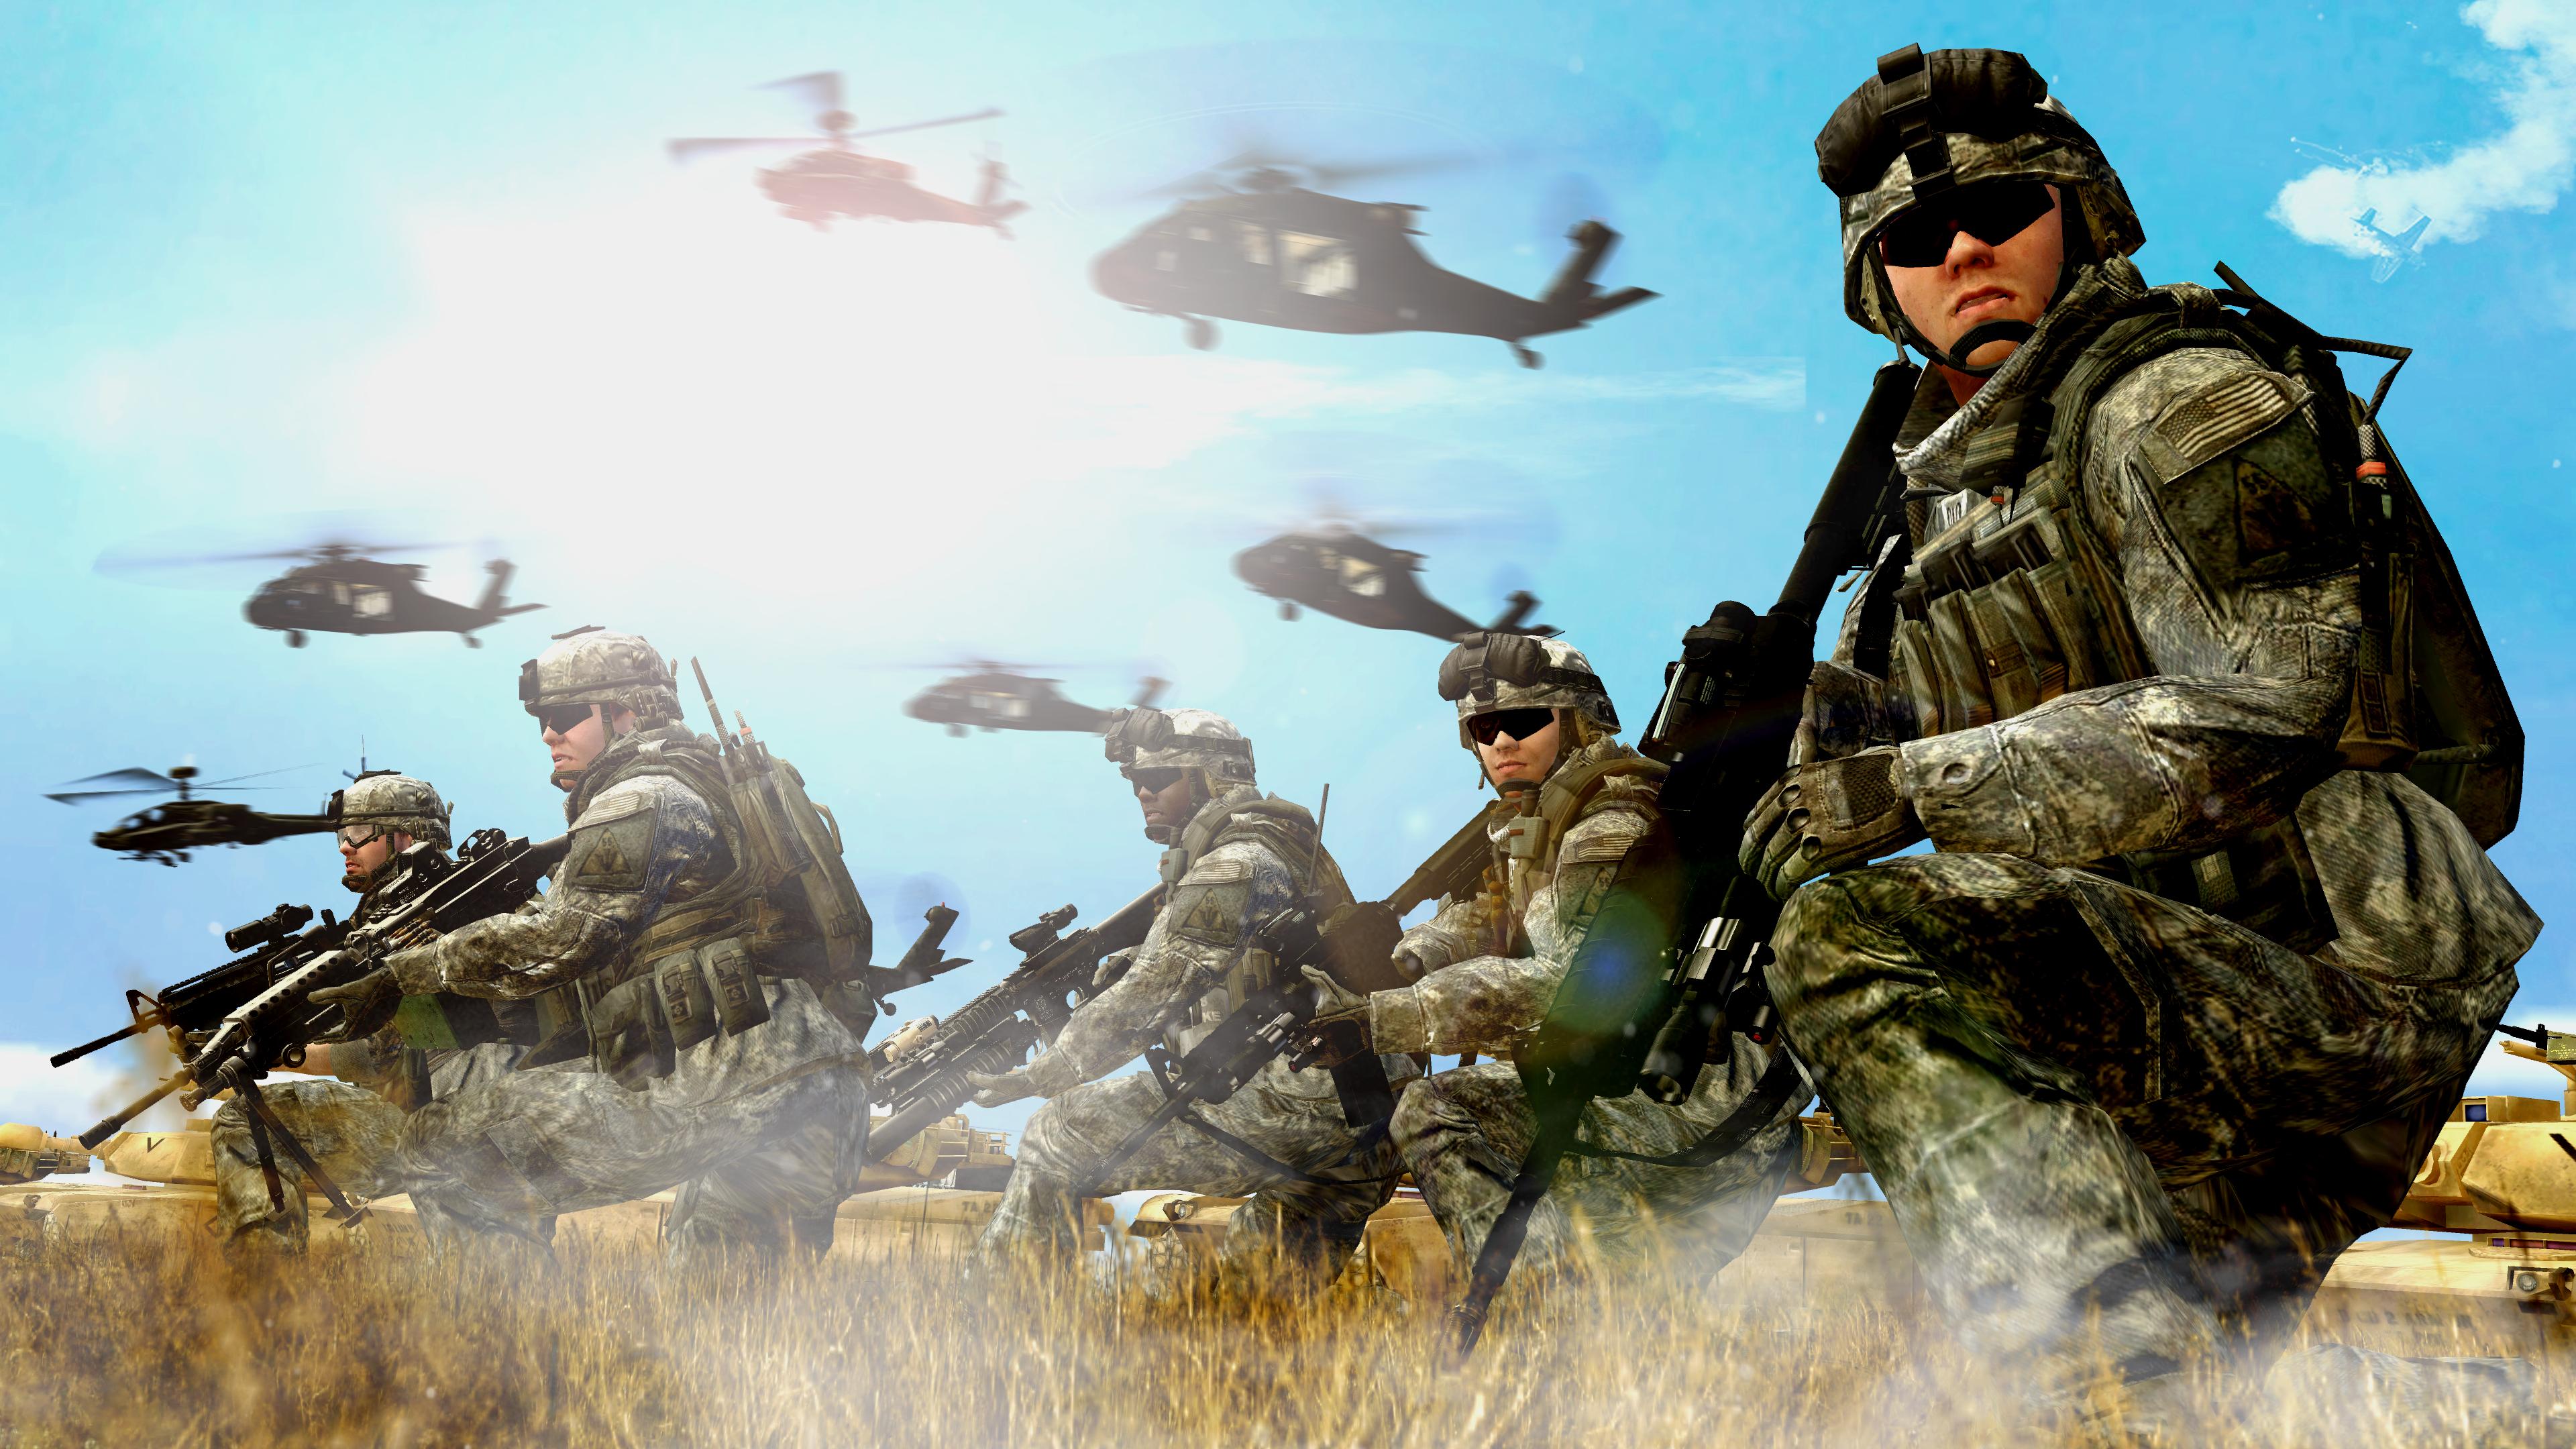 Rangers Lead the Way by LordHayabusa357